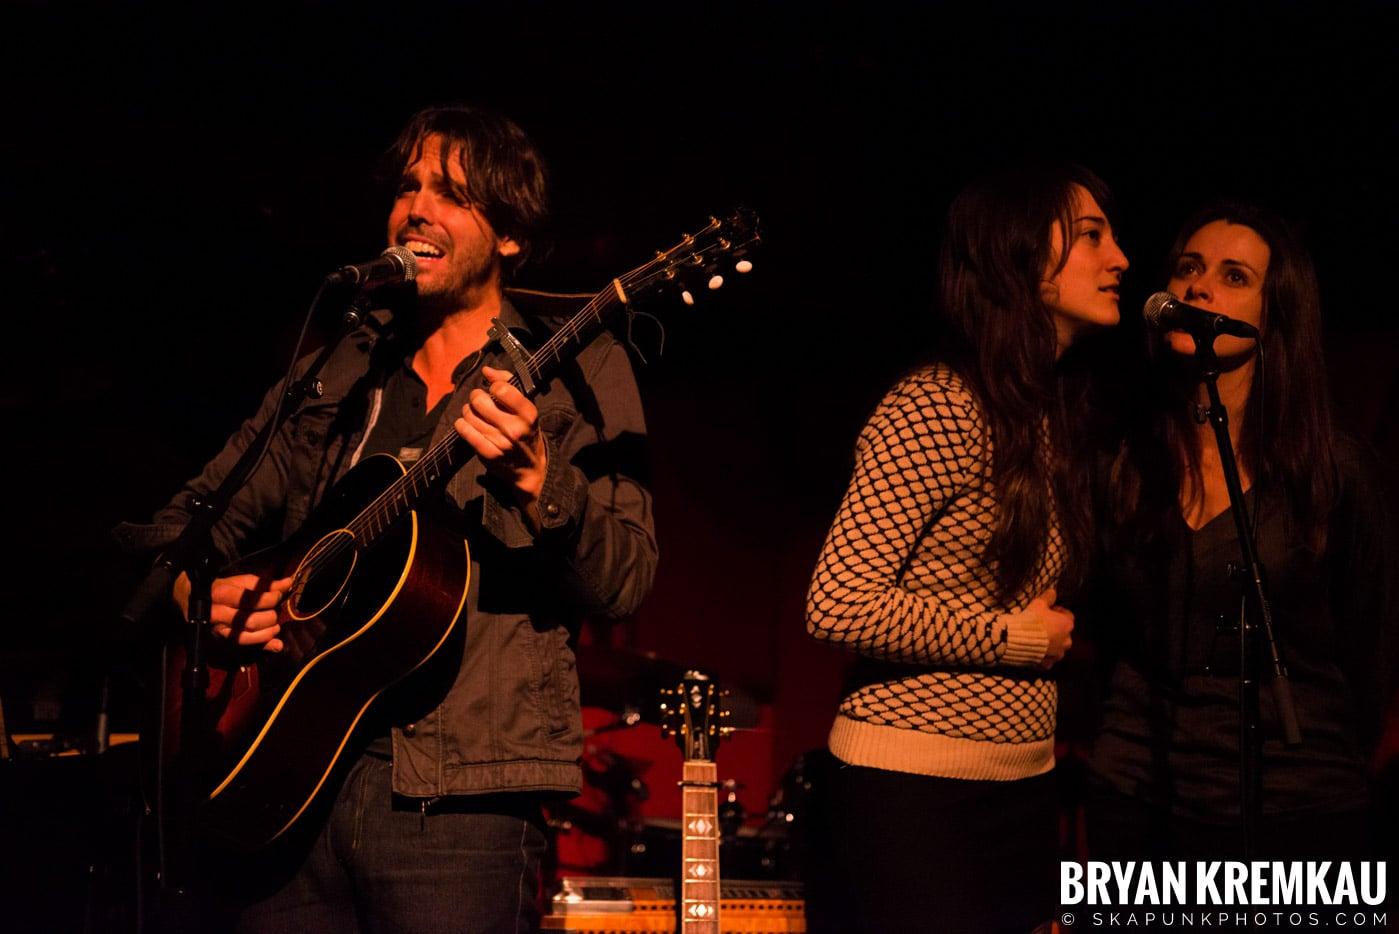 Peter Bradley Adams @ Rockwood Music Hall, NYC - 3.9.13 (2)